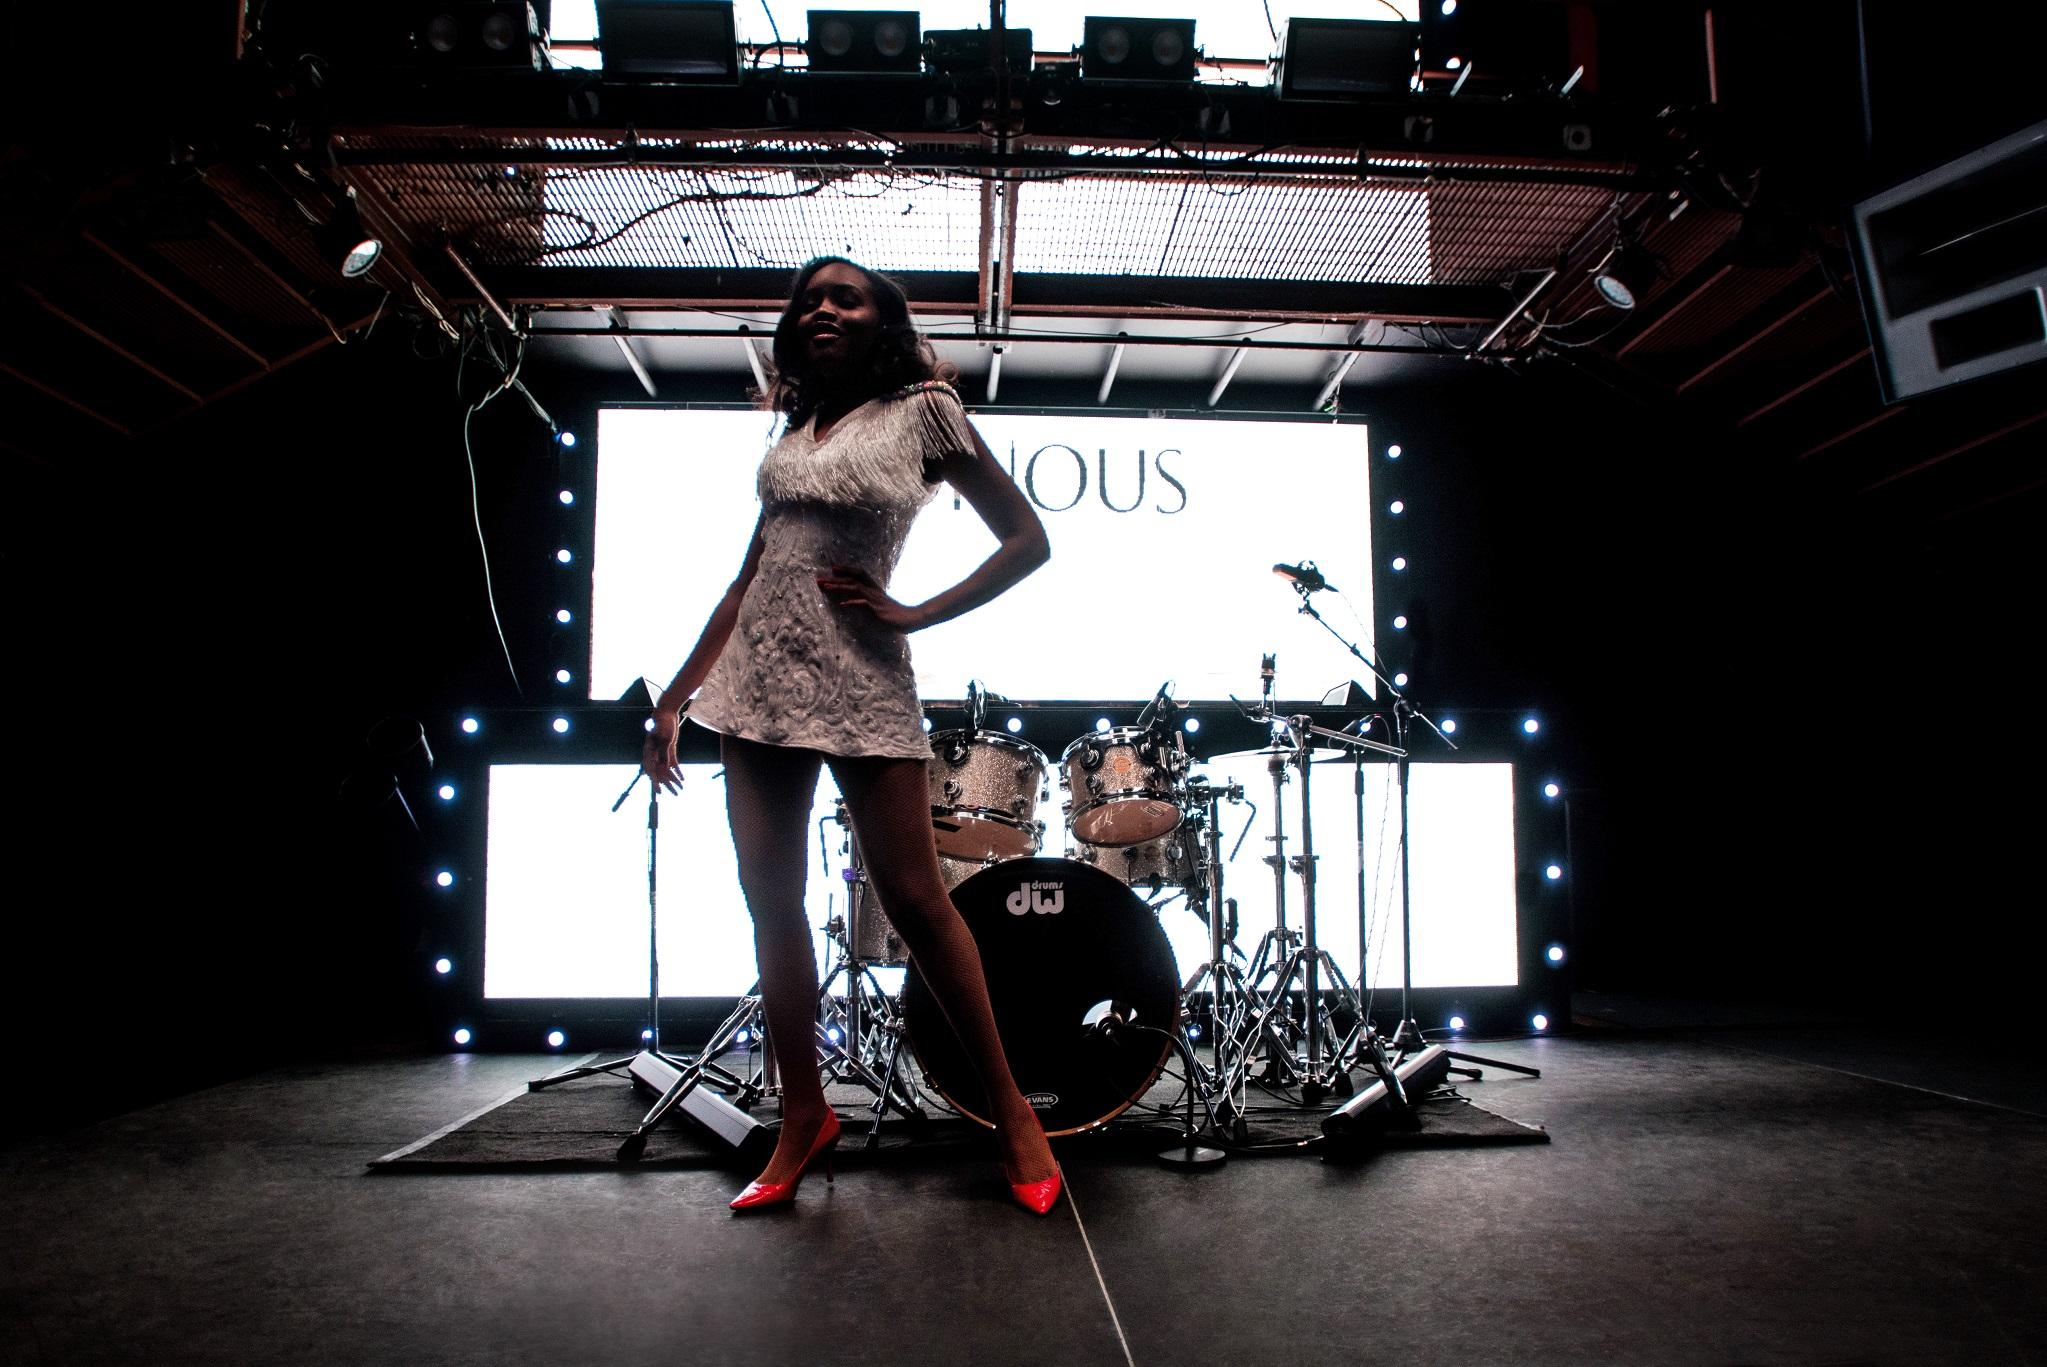 Glorious-Pop Singer-Livetronica Drummer-Producer-Songwriter-Marquee-Nightclub-Video-New York-NY-4LR.jpg